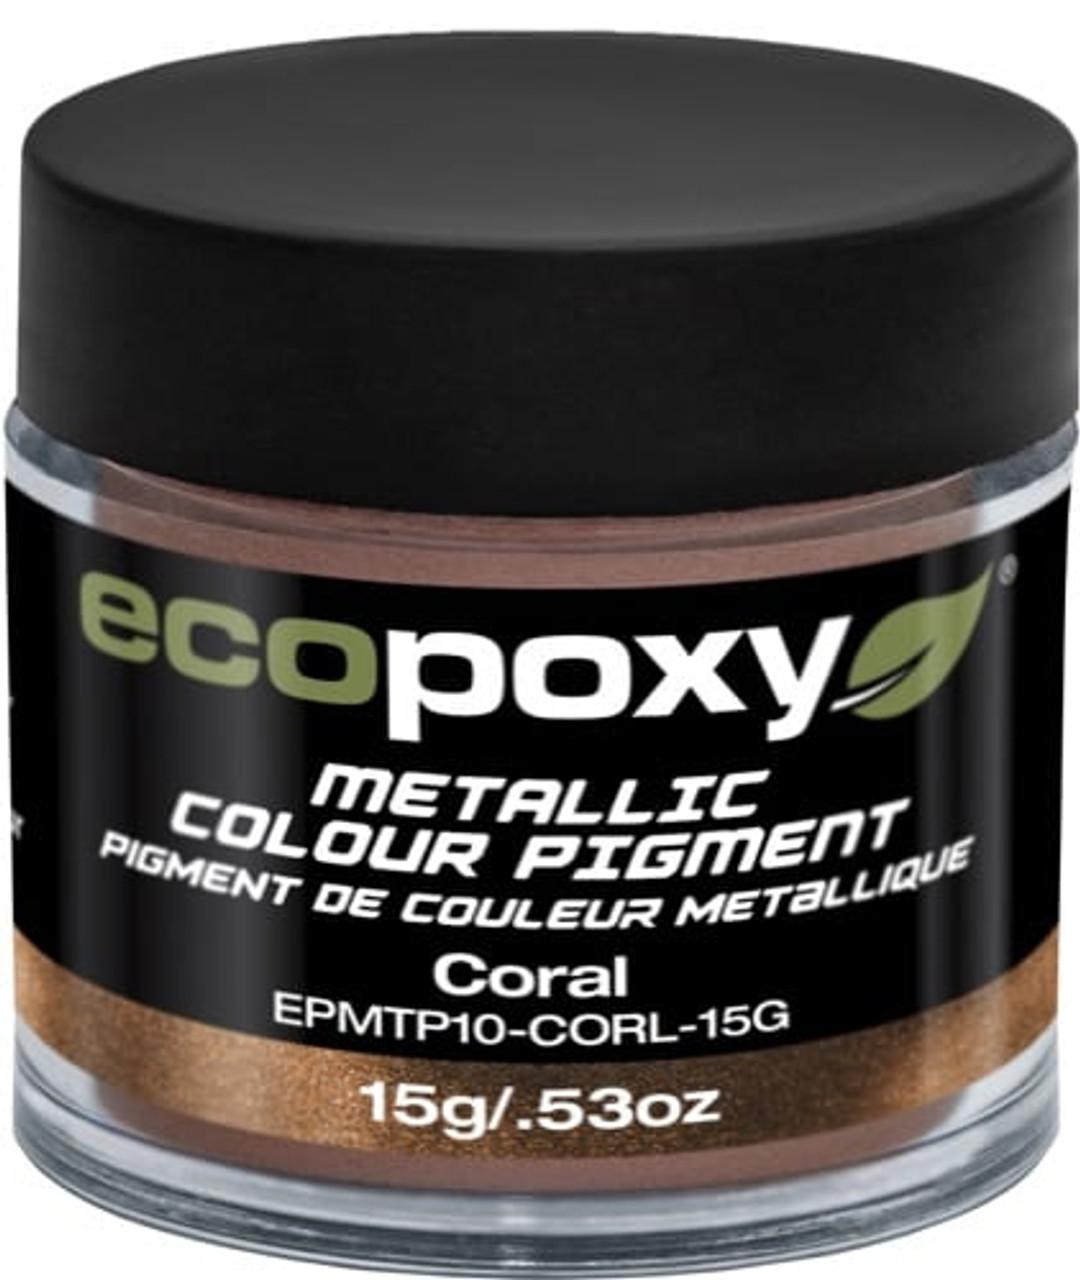 EcoPoxy - 15g Metallic ColorPigment - Coral (628199906066)